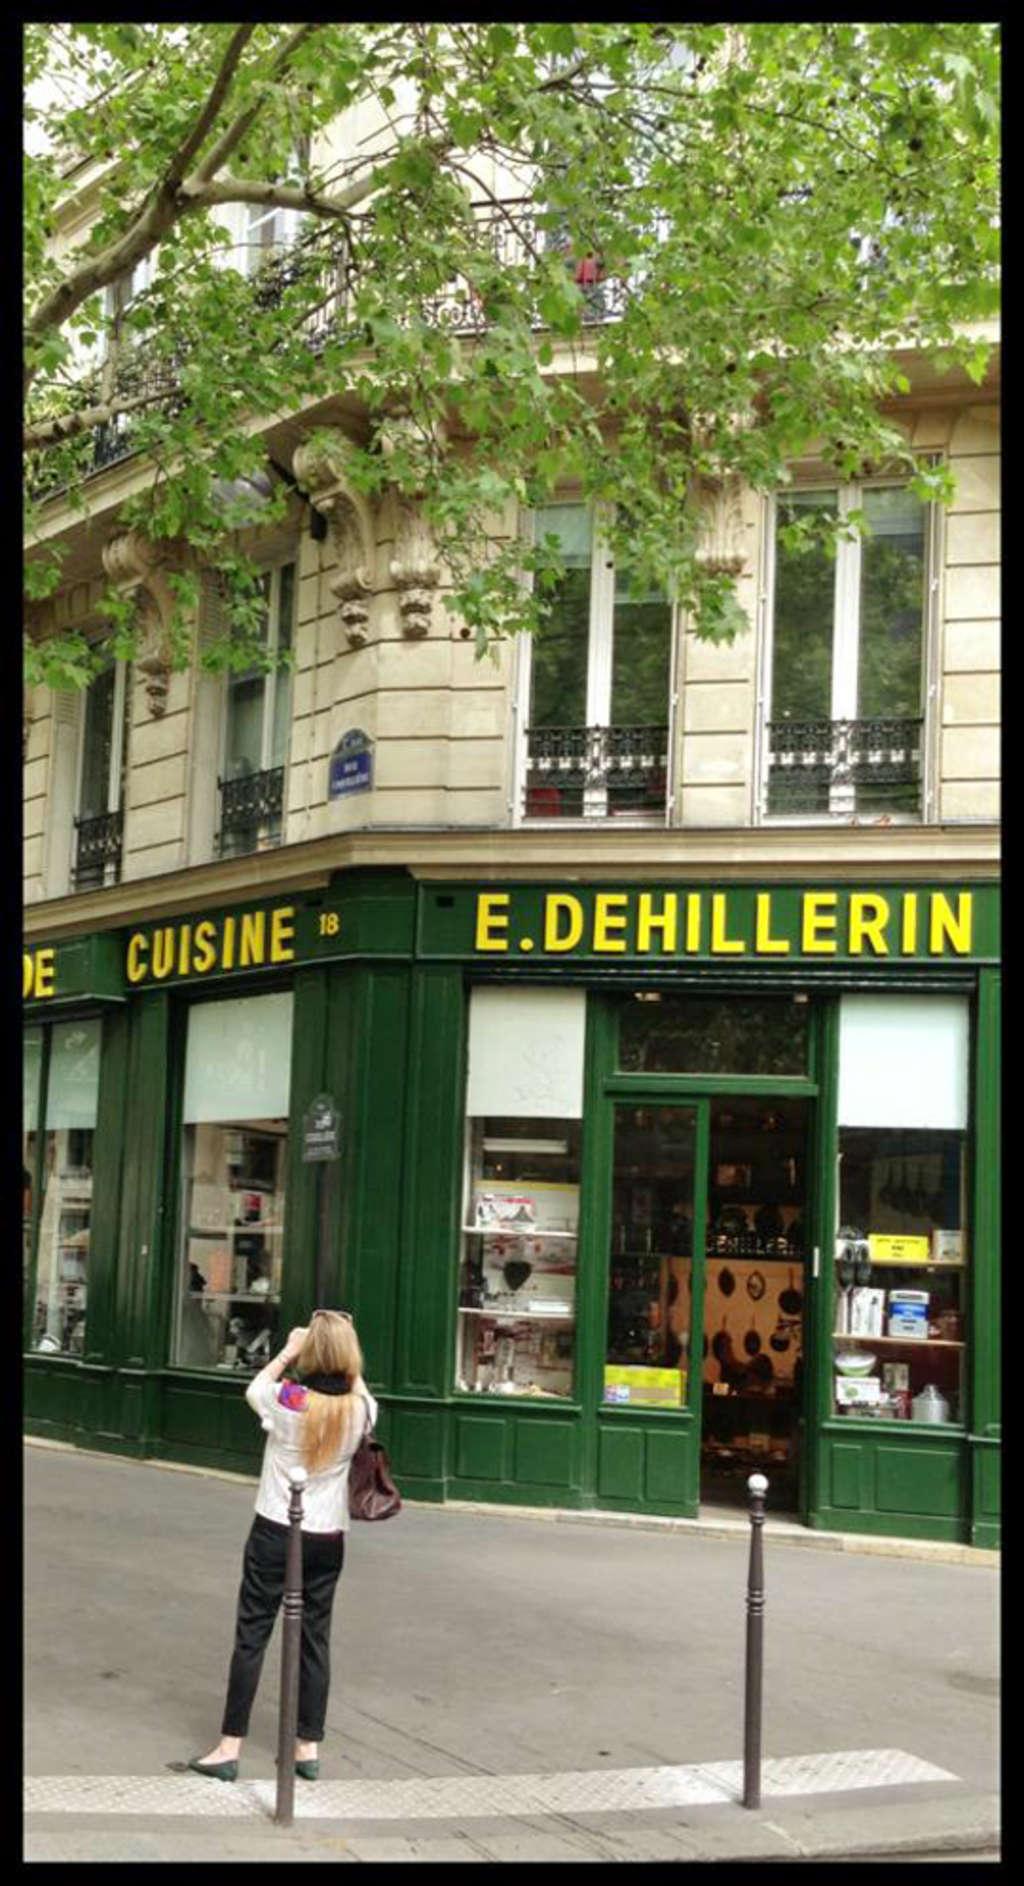 My Favorite Kitchen Souvenirs From E. Dehillerin in Paris